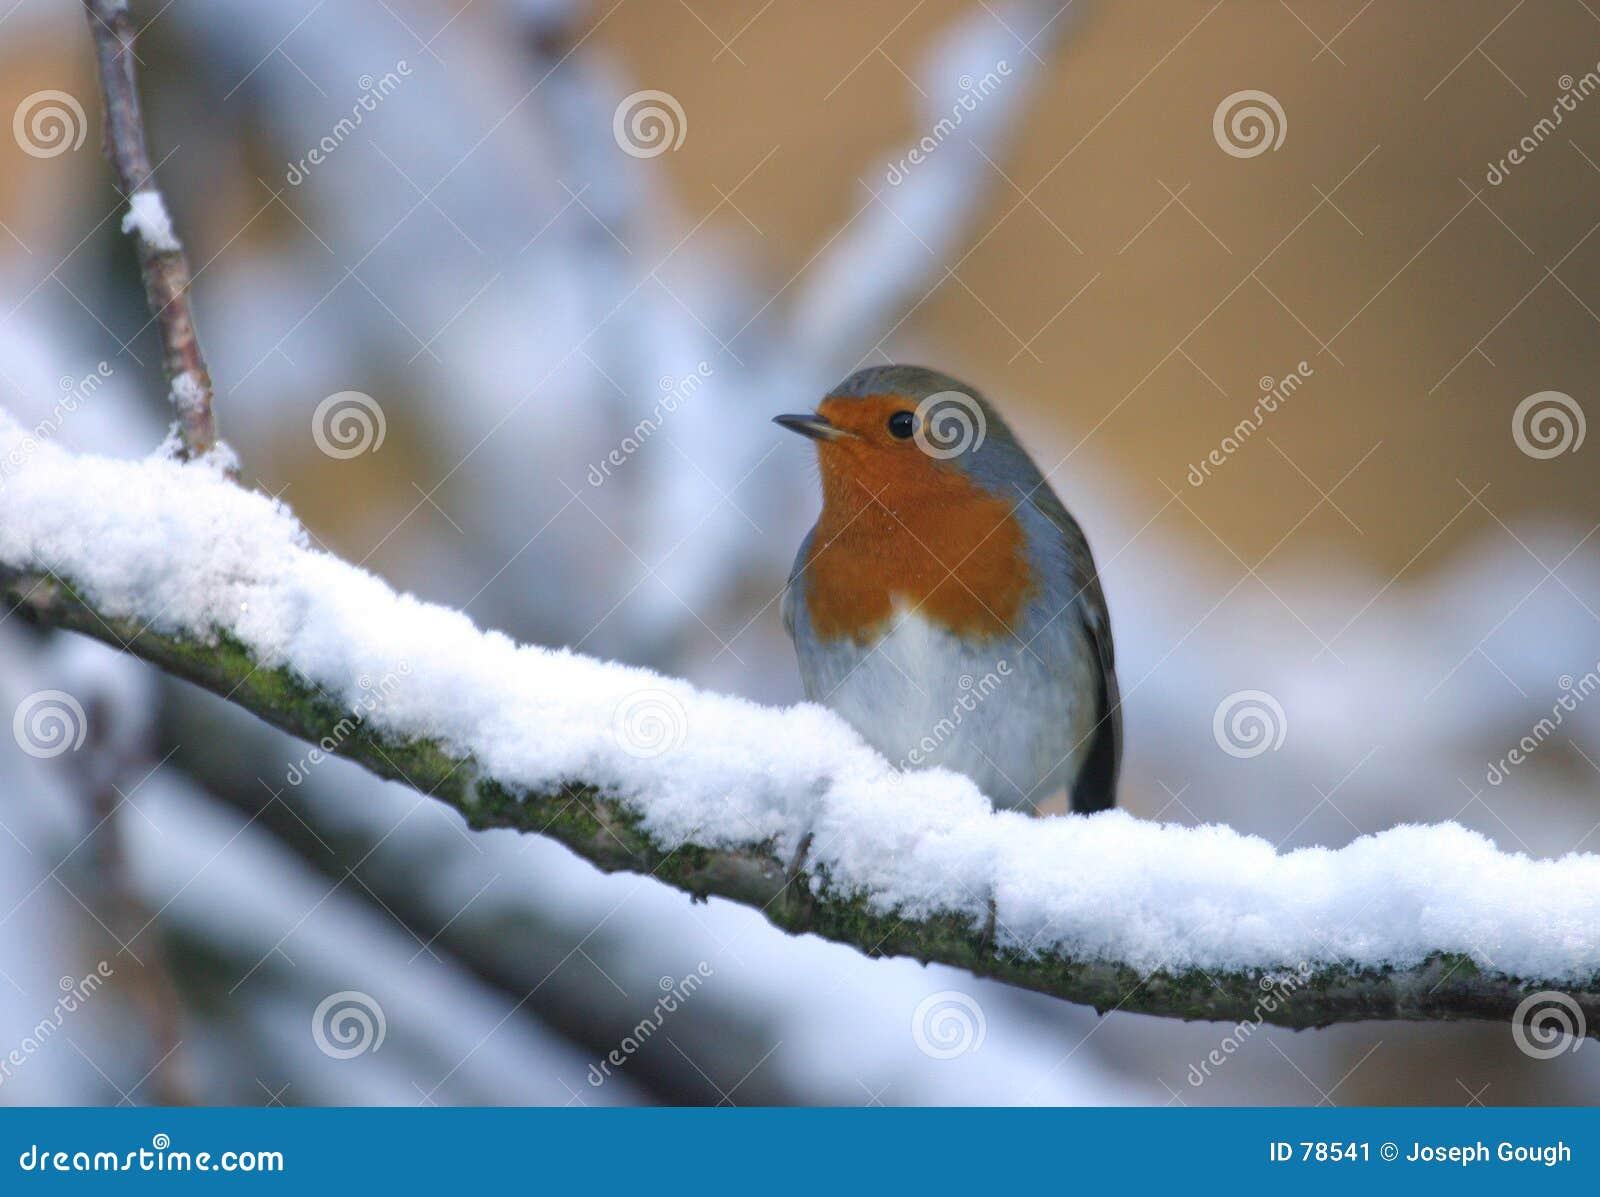 robin vogel im winter schnee baum stockbild bild 78541. Black Bedroom Furniture Sets. Home Design Ideas